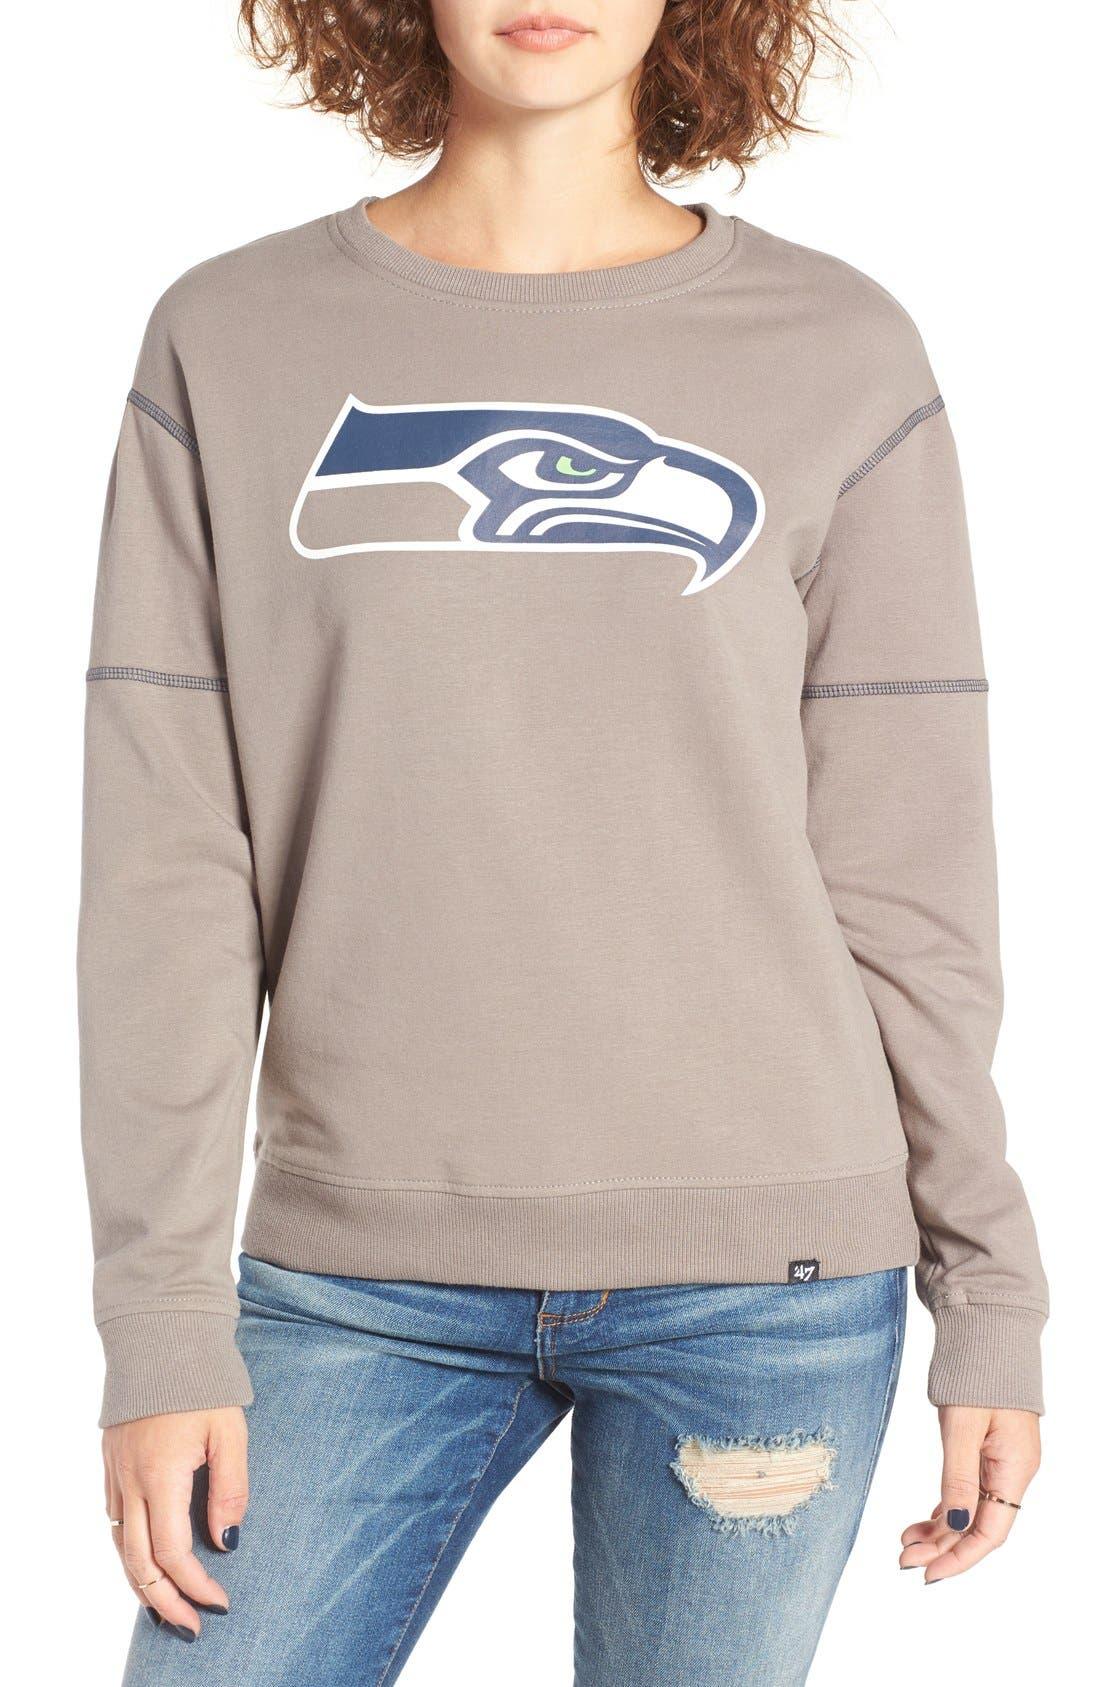 Alternate Image 1 Selected - 47 Brand 'Seattle Seahawks' Graphic Sweatshirt